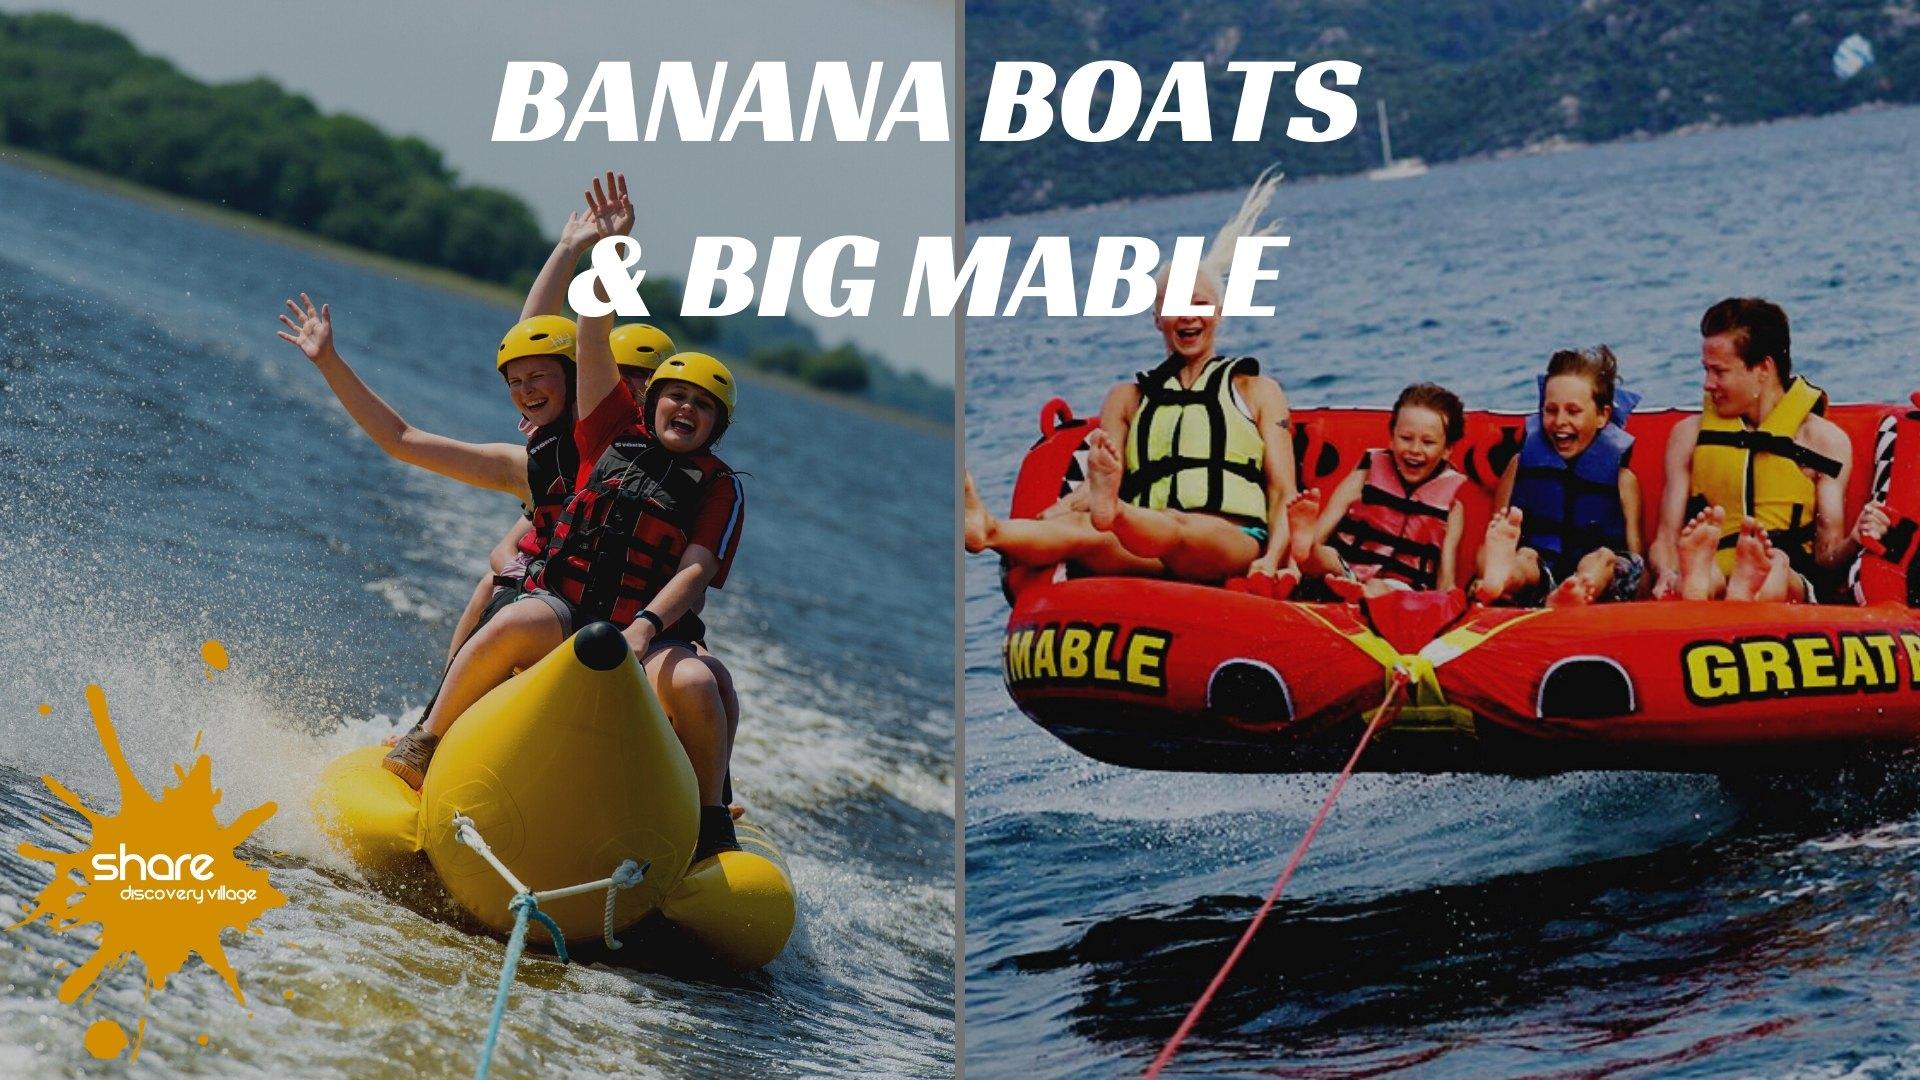 Banana Boats & Big Mable